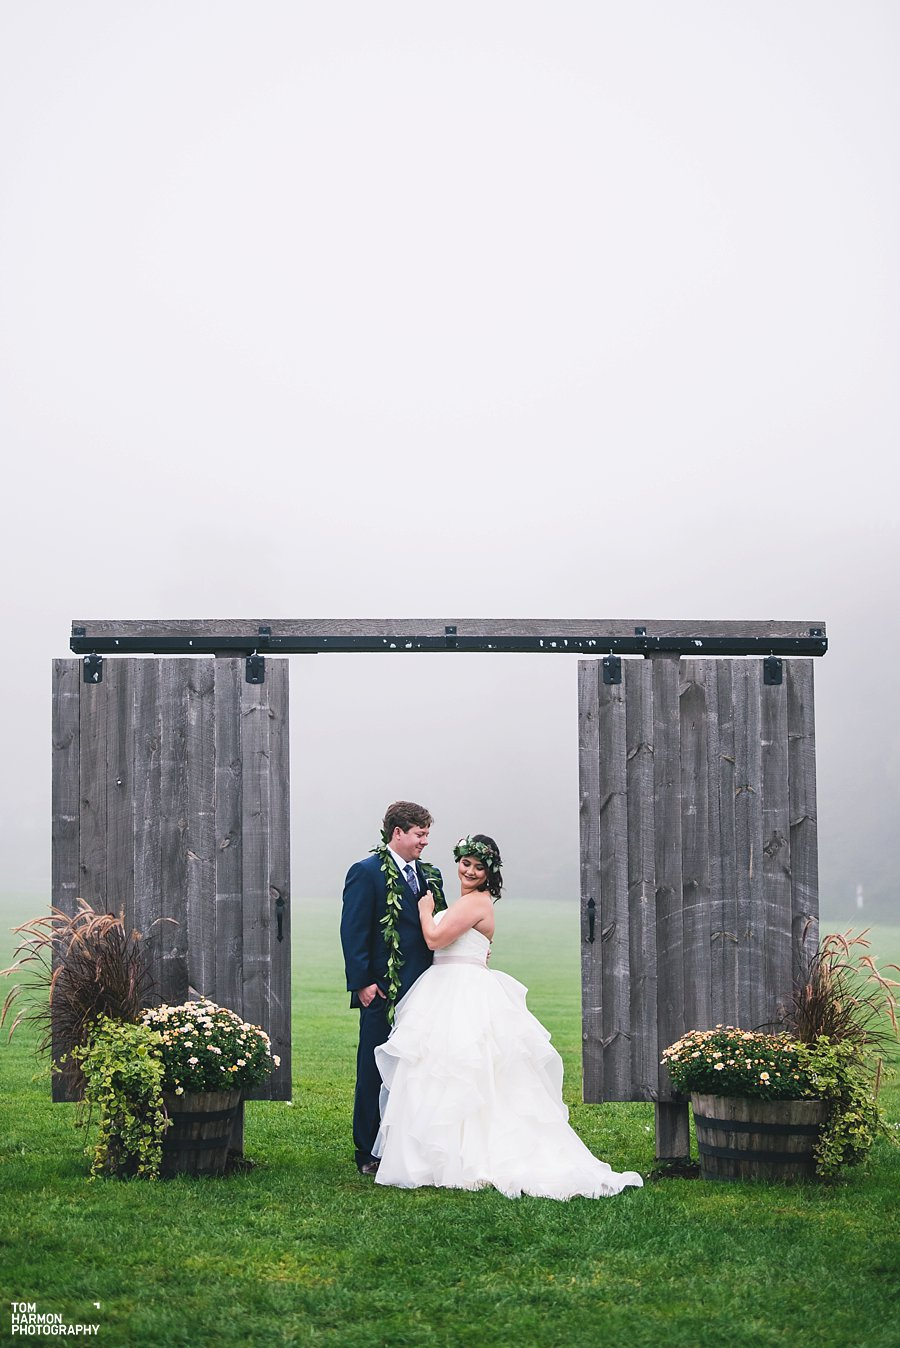 natasha and jason's mountain top inn wedding. | new jersey wedding